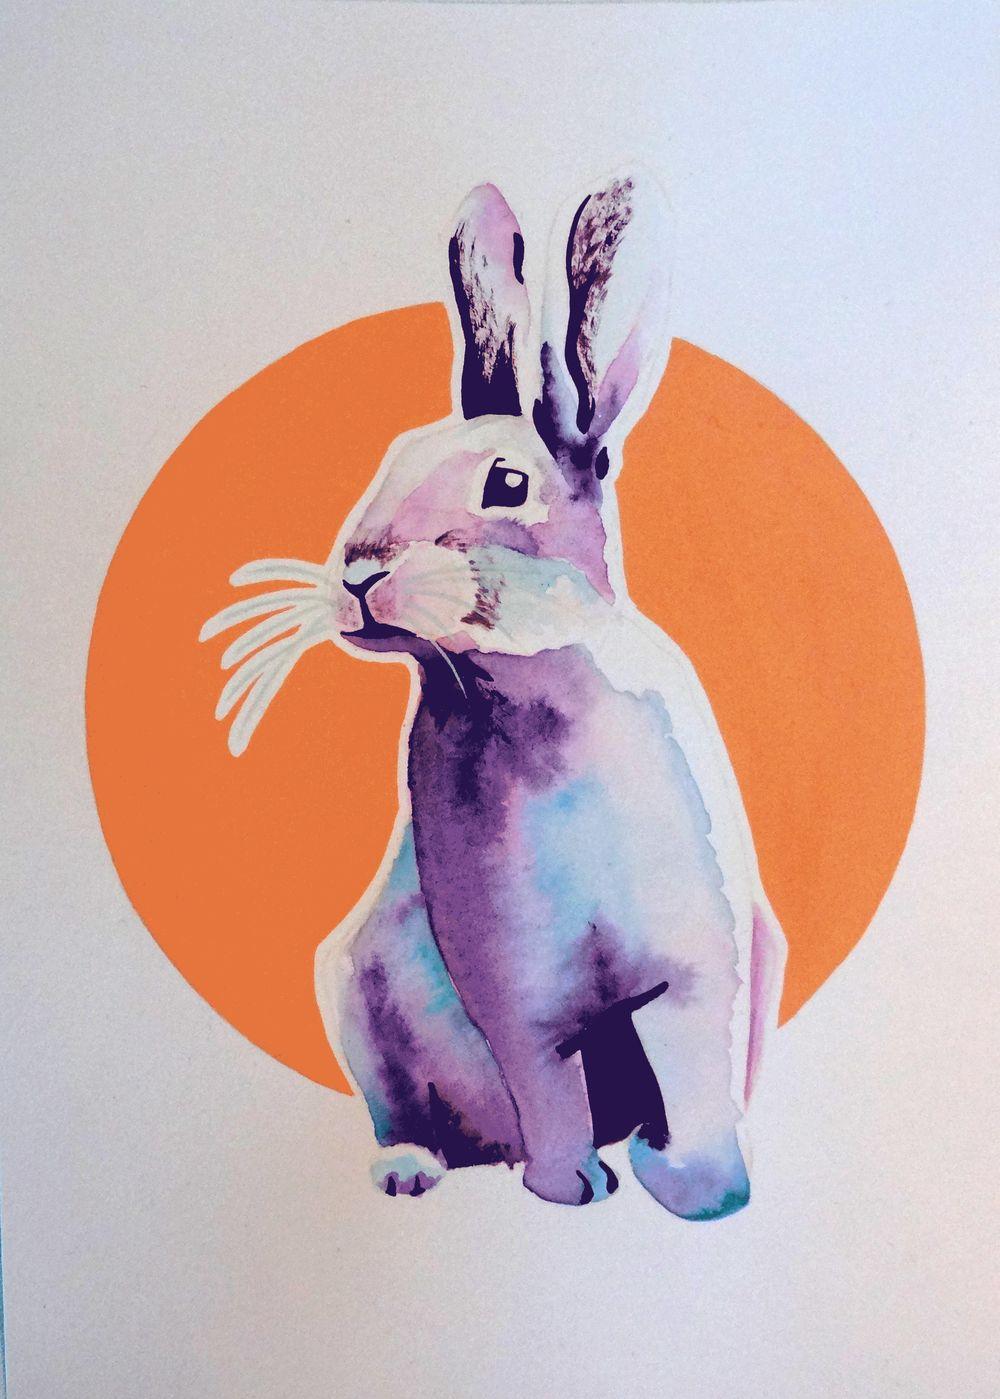 Colorsplash Animals :) - image 3 - student project